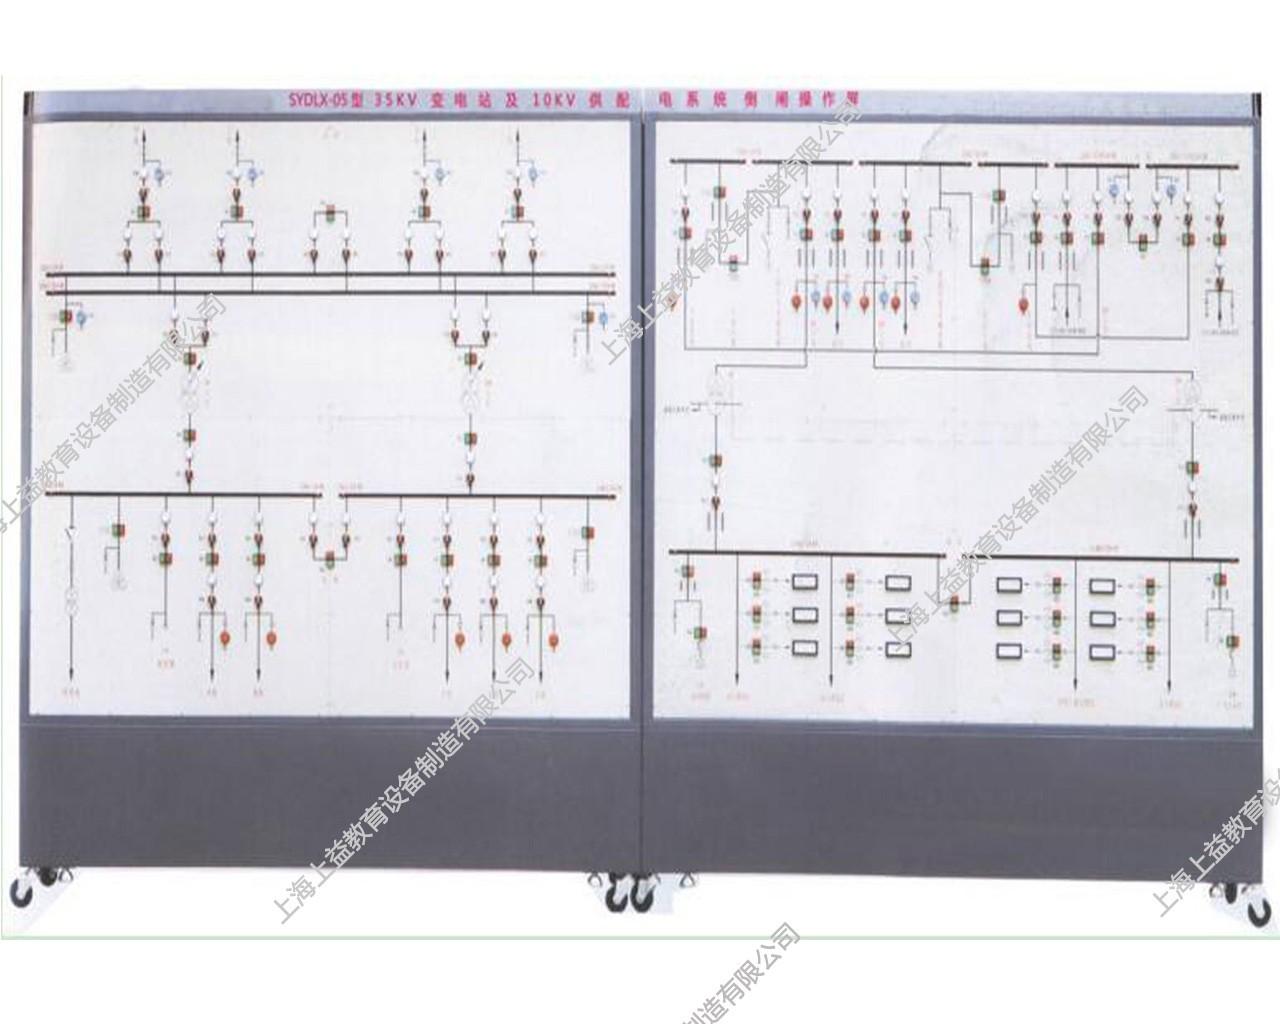 SYDLX-05型35kV变电站及10kV供配电系统倒闸操作屏